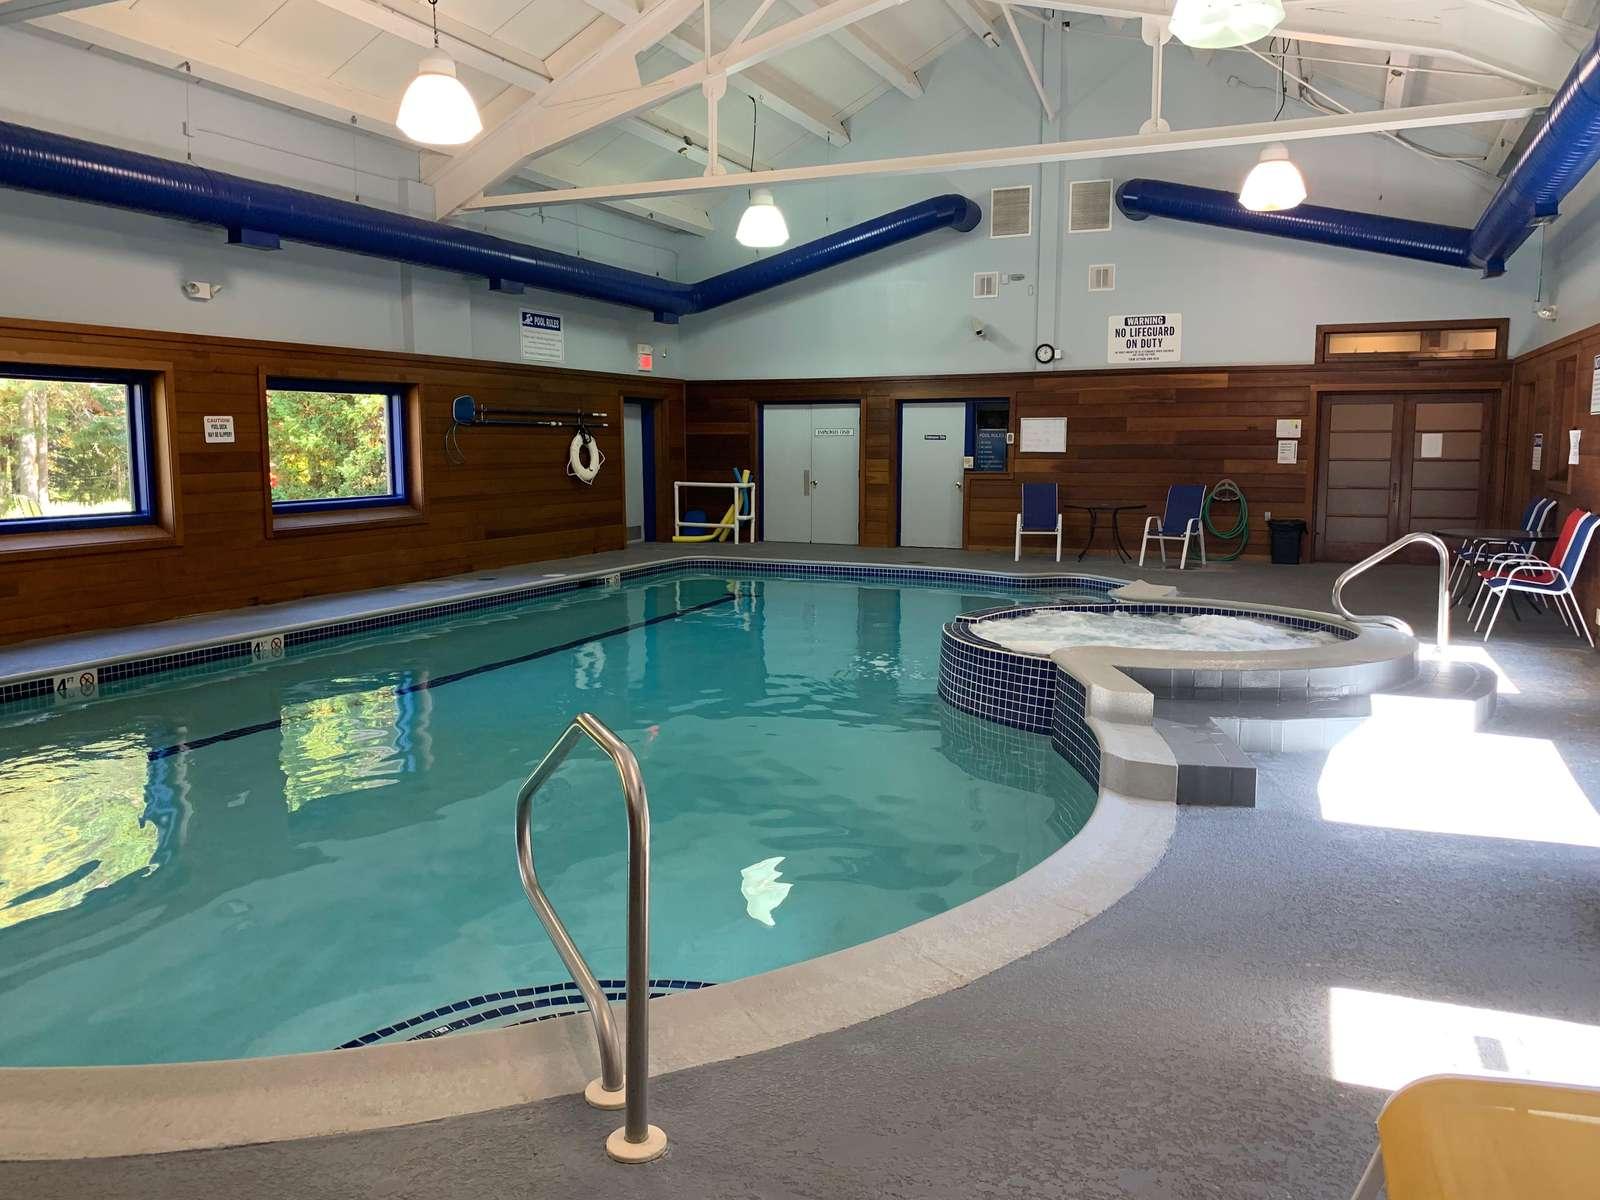 Pool & Hot Tub in Sugarhouse Amenity Center